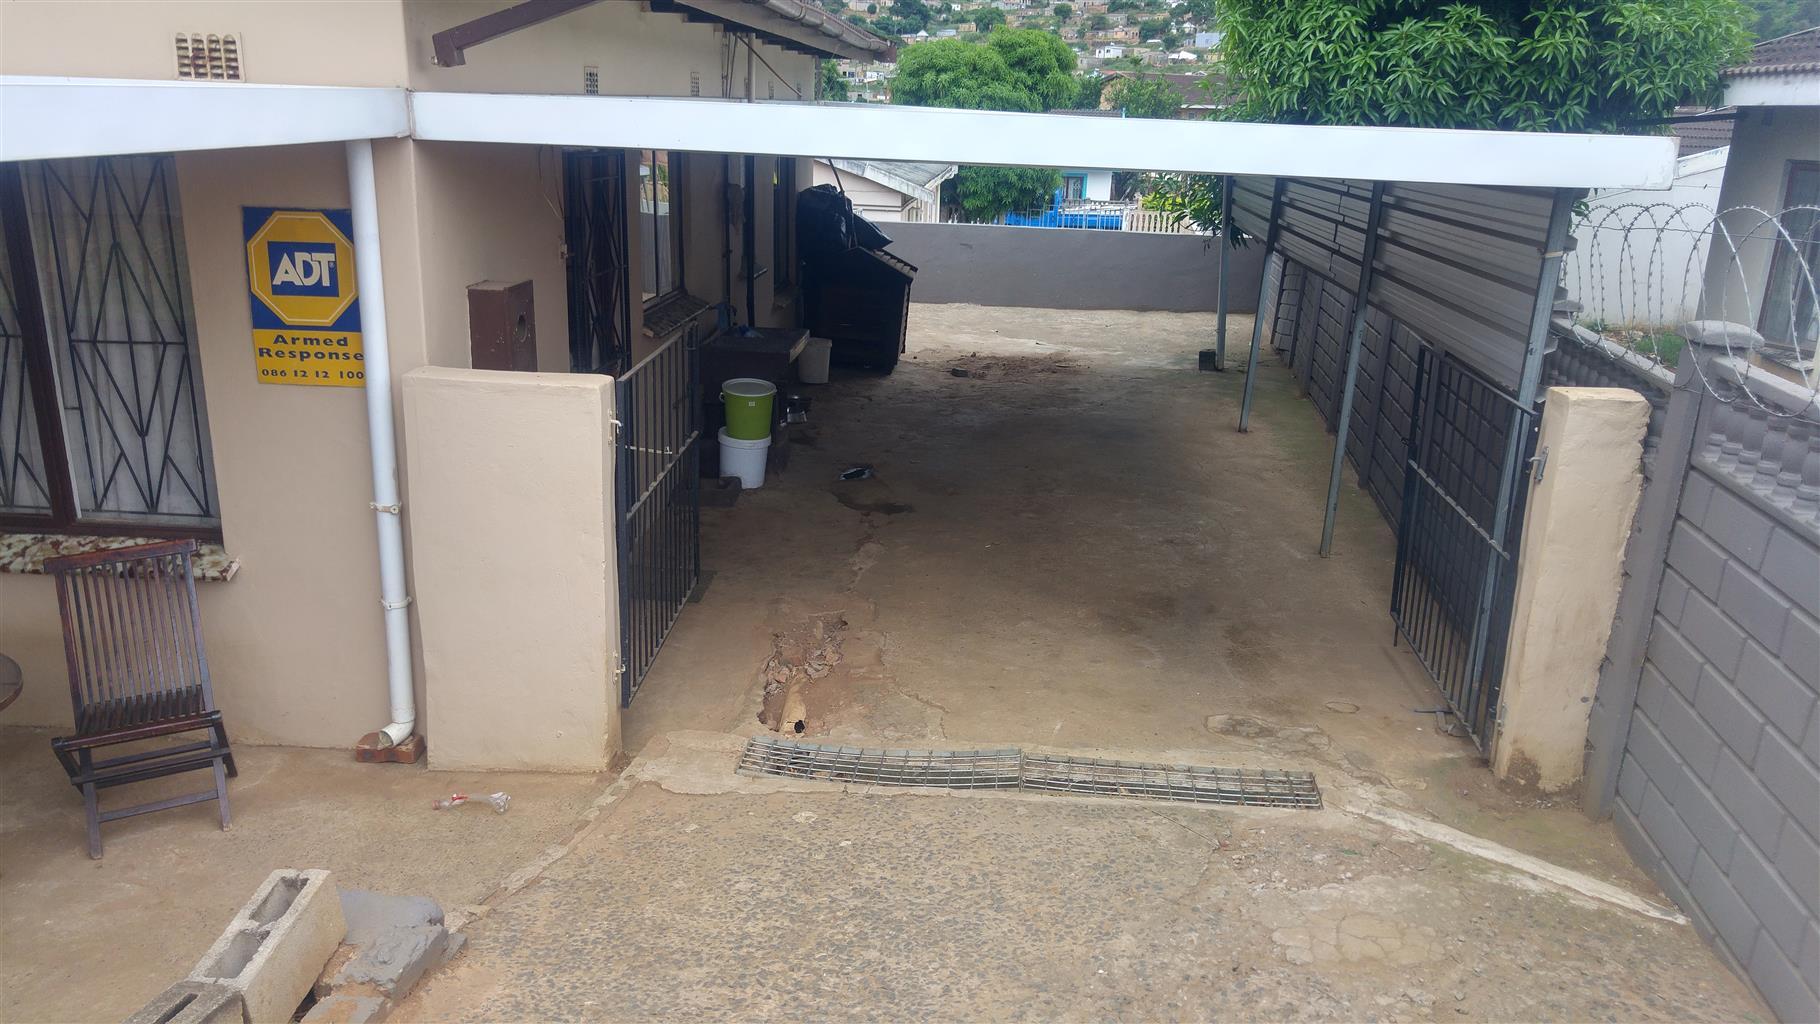 SECURE THREE BEDROOM FREESTANDING HOME IN PALMVIEW